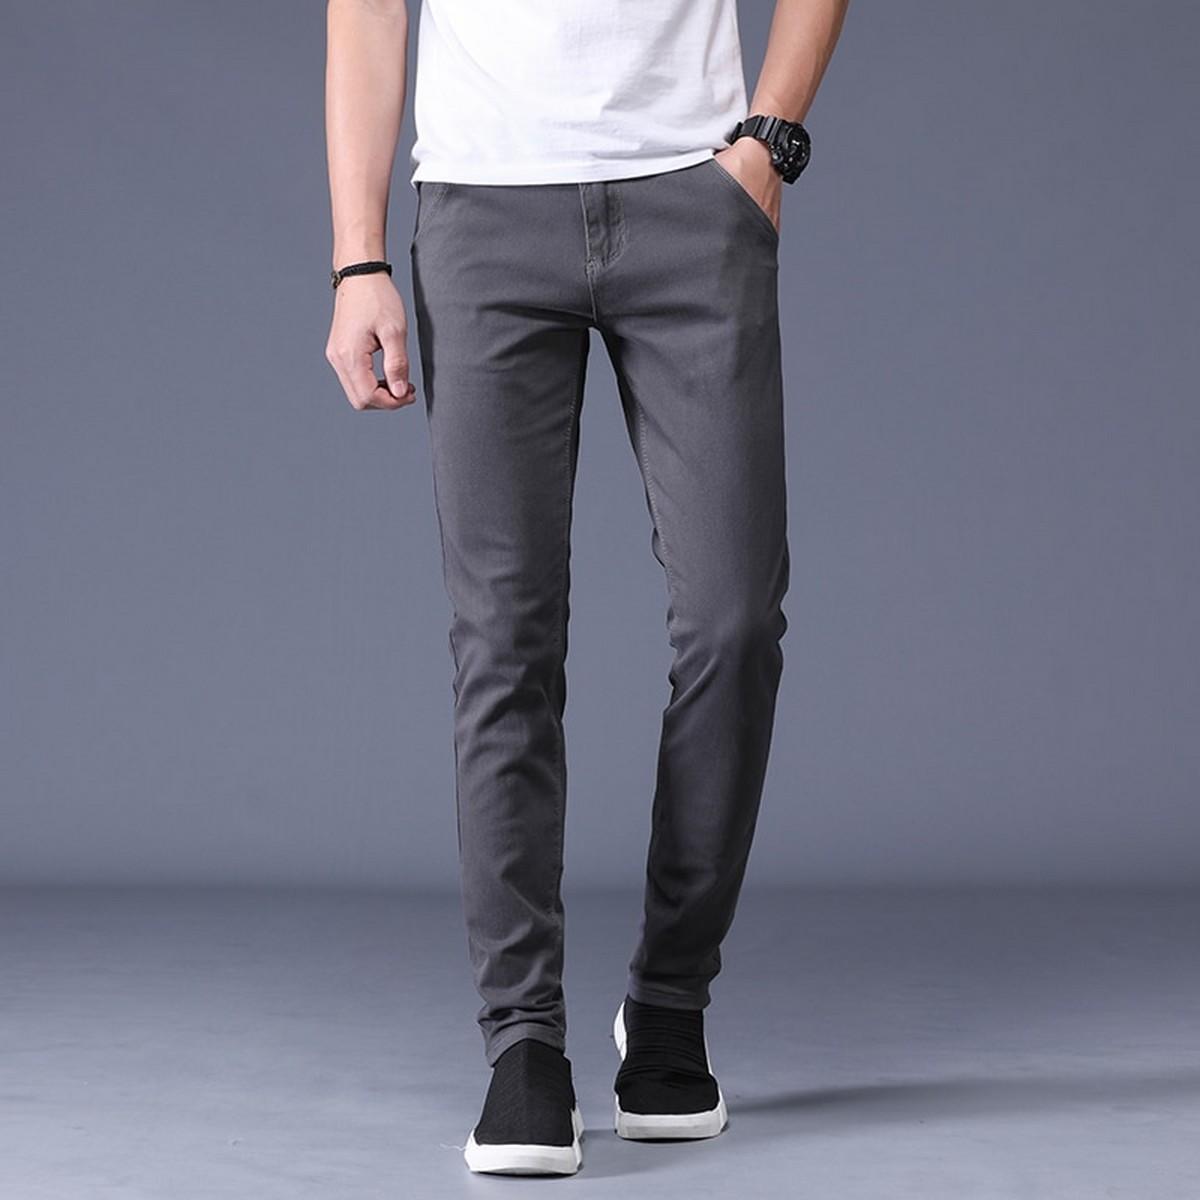 Mens Pants Cotton Jeans pants for Men in Dark Grey Color and Regular Fit Pattern